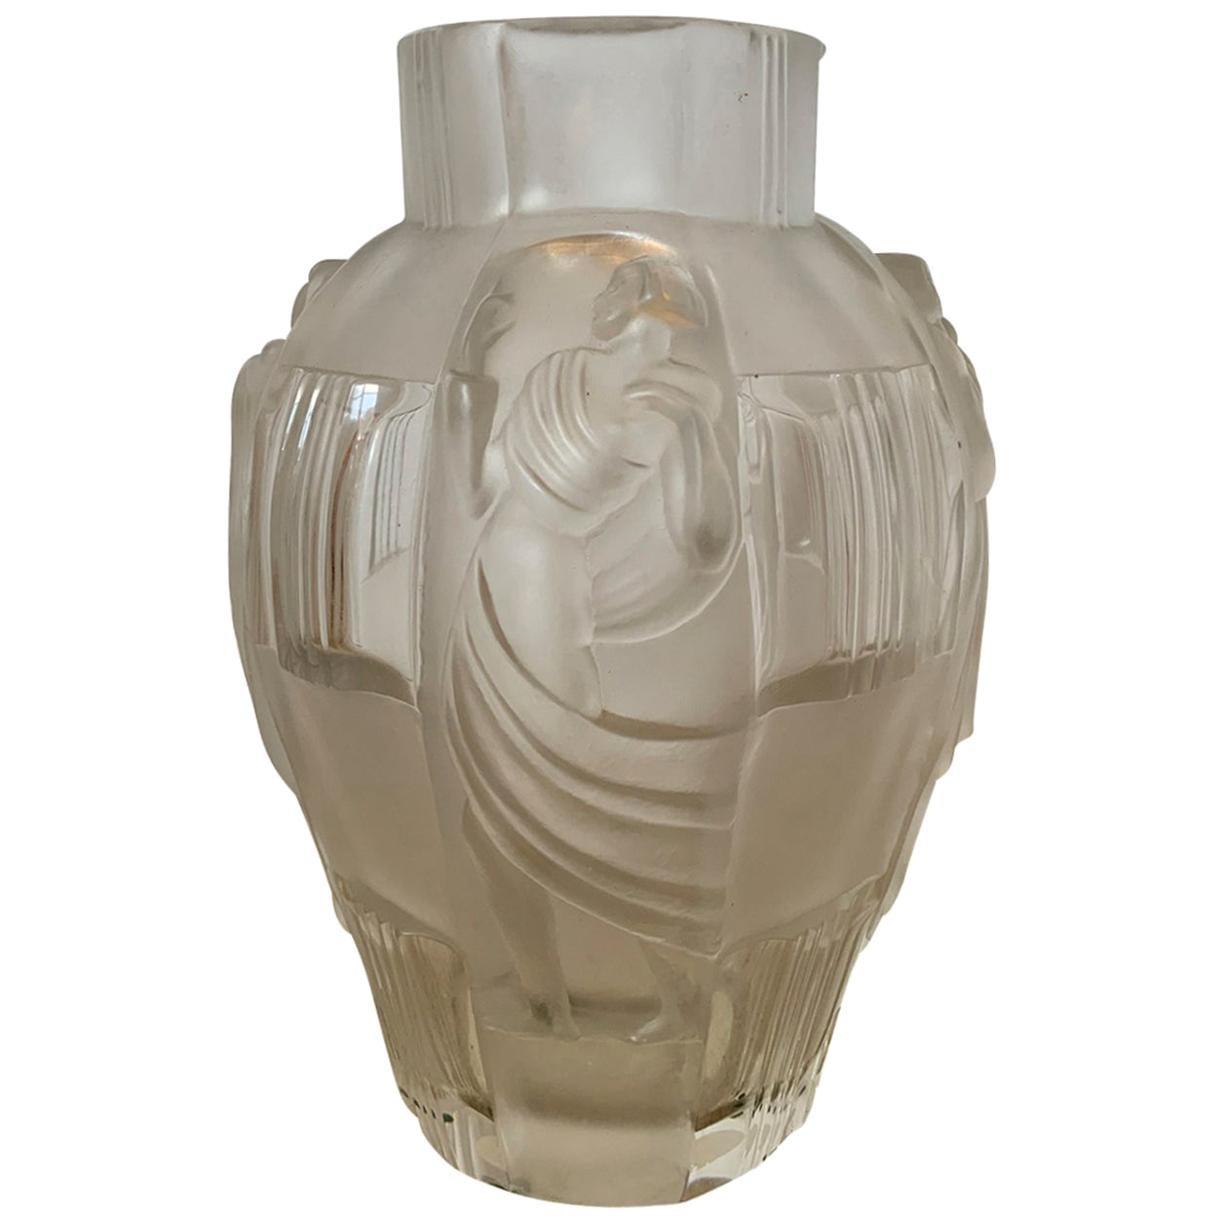 20th Century Art Deco Style Glass Vase